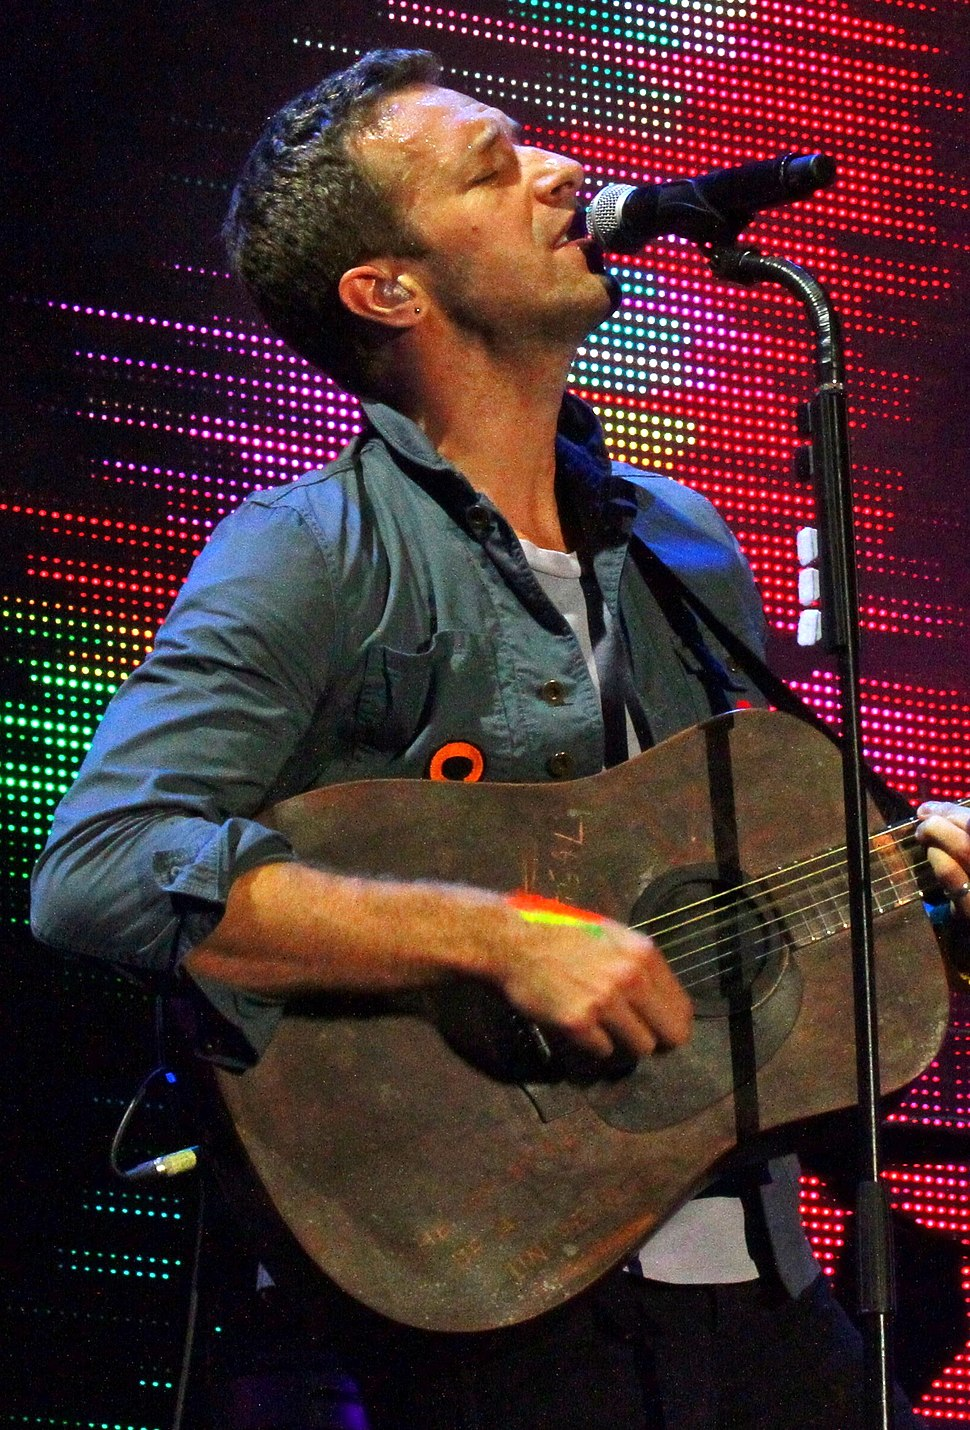 Chris Martin + Guitar, 2011 (1, cropped)